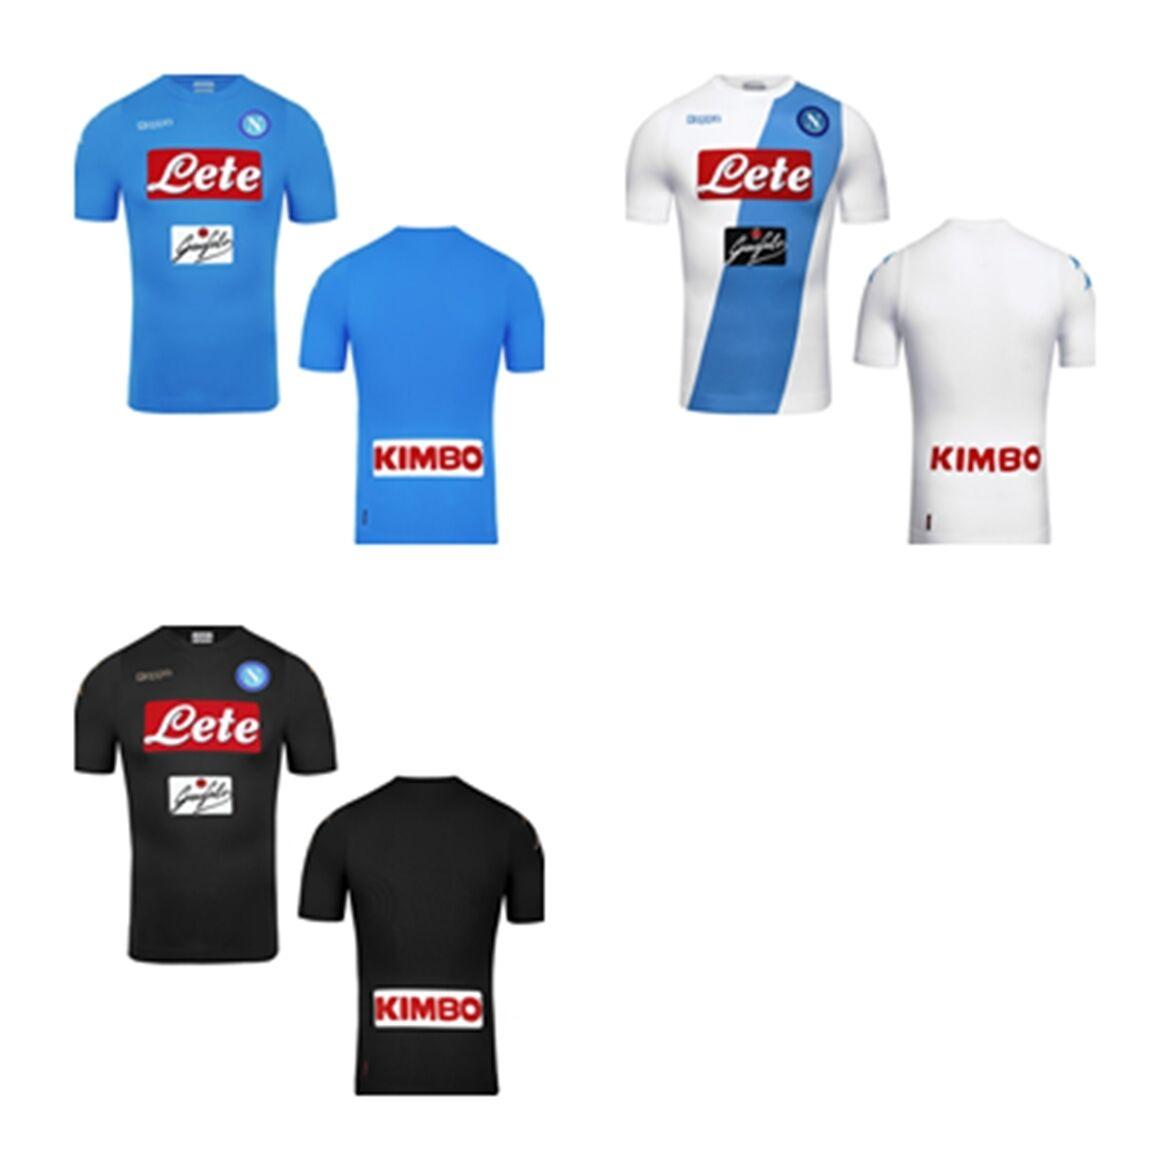 FW16 Napoli Kappa Trikot Kombat Haut 2017 T-Shirt Trikot Jersey